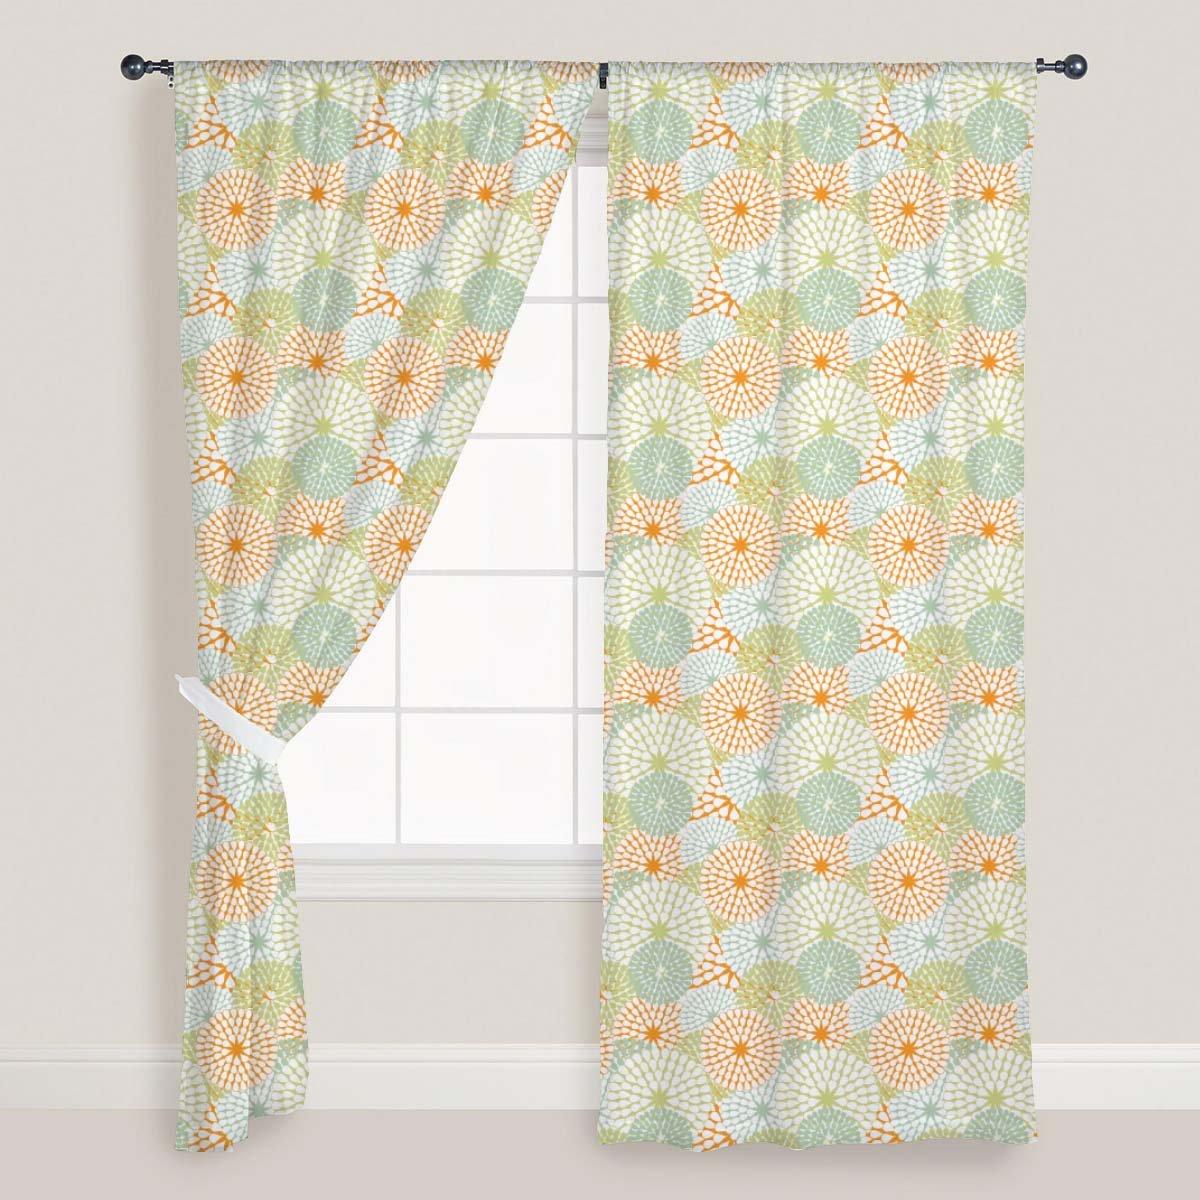 AZ Floral Texture Door & Window Curtain Satin 4feet x 11feet; SET OF 3 PCS